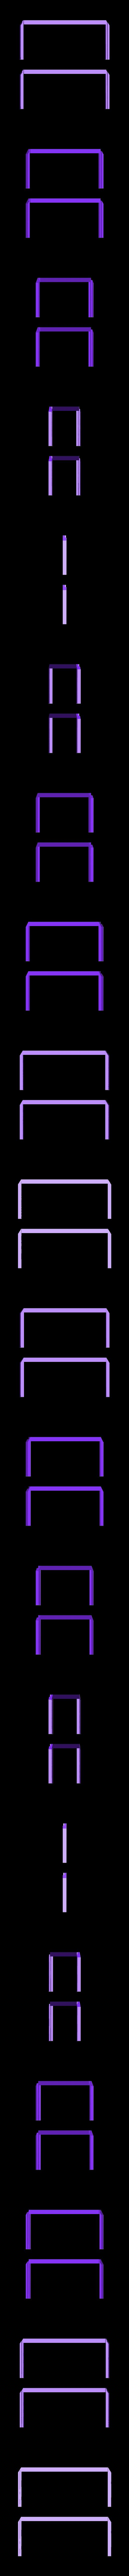 Corner_Trim.stl Download free STL file HO Scale Big Red Barn • 3D printer template, kabrumble